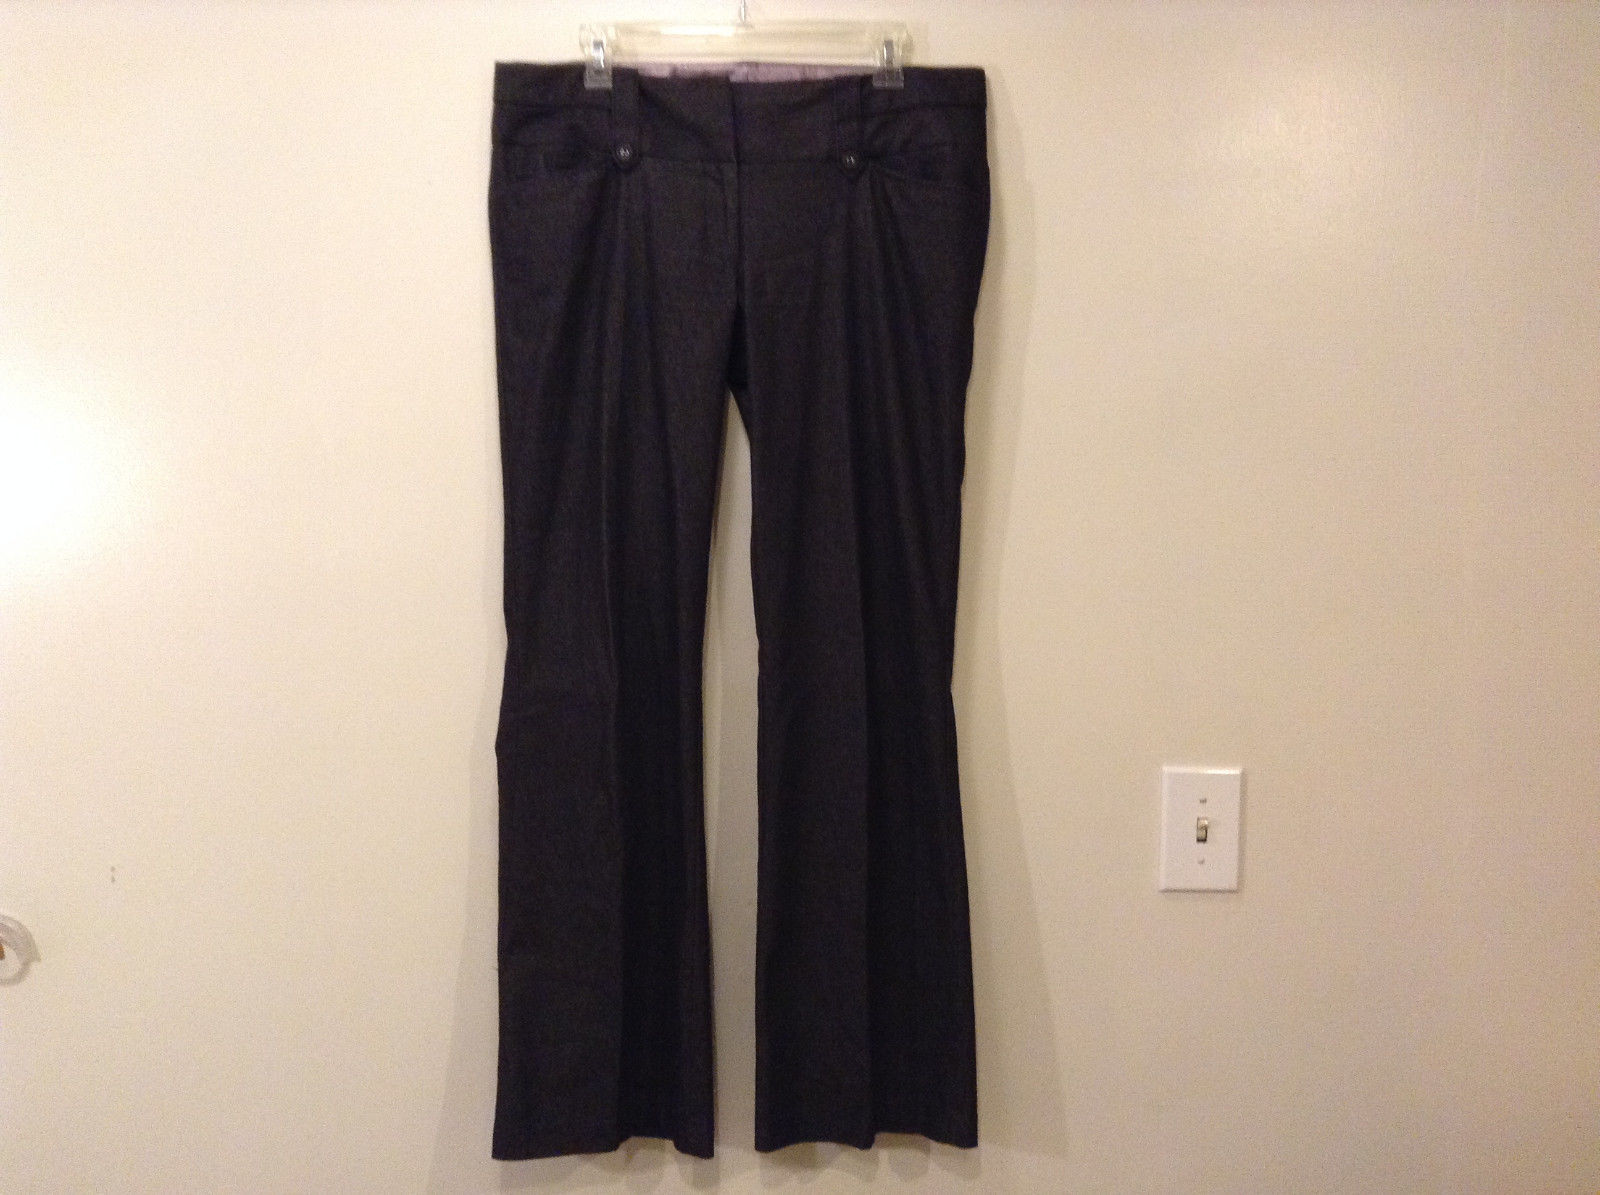 Juniors Girls Stooshy Dark Gray Dress Pants Size 11 Cotton Polyester Spandex